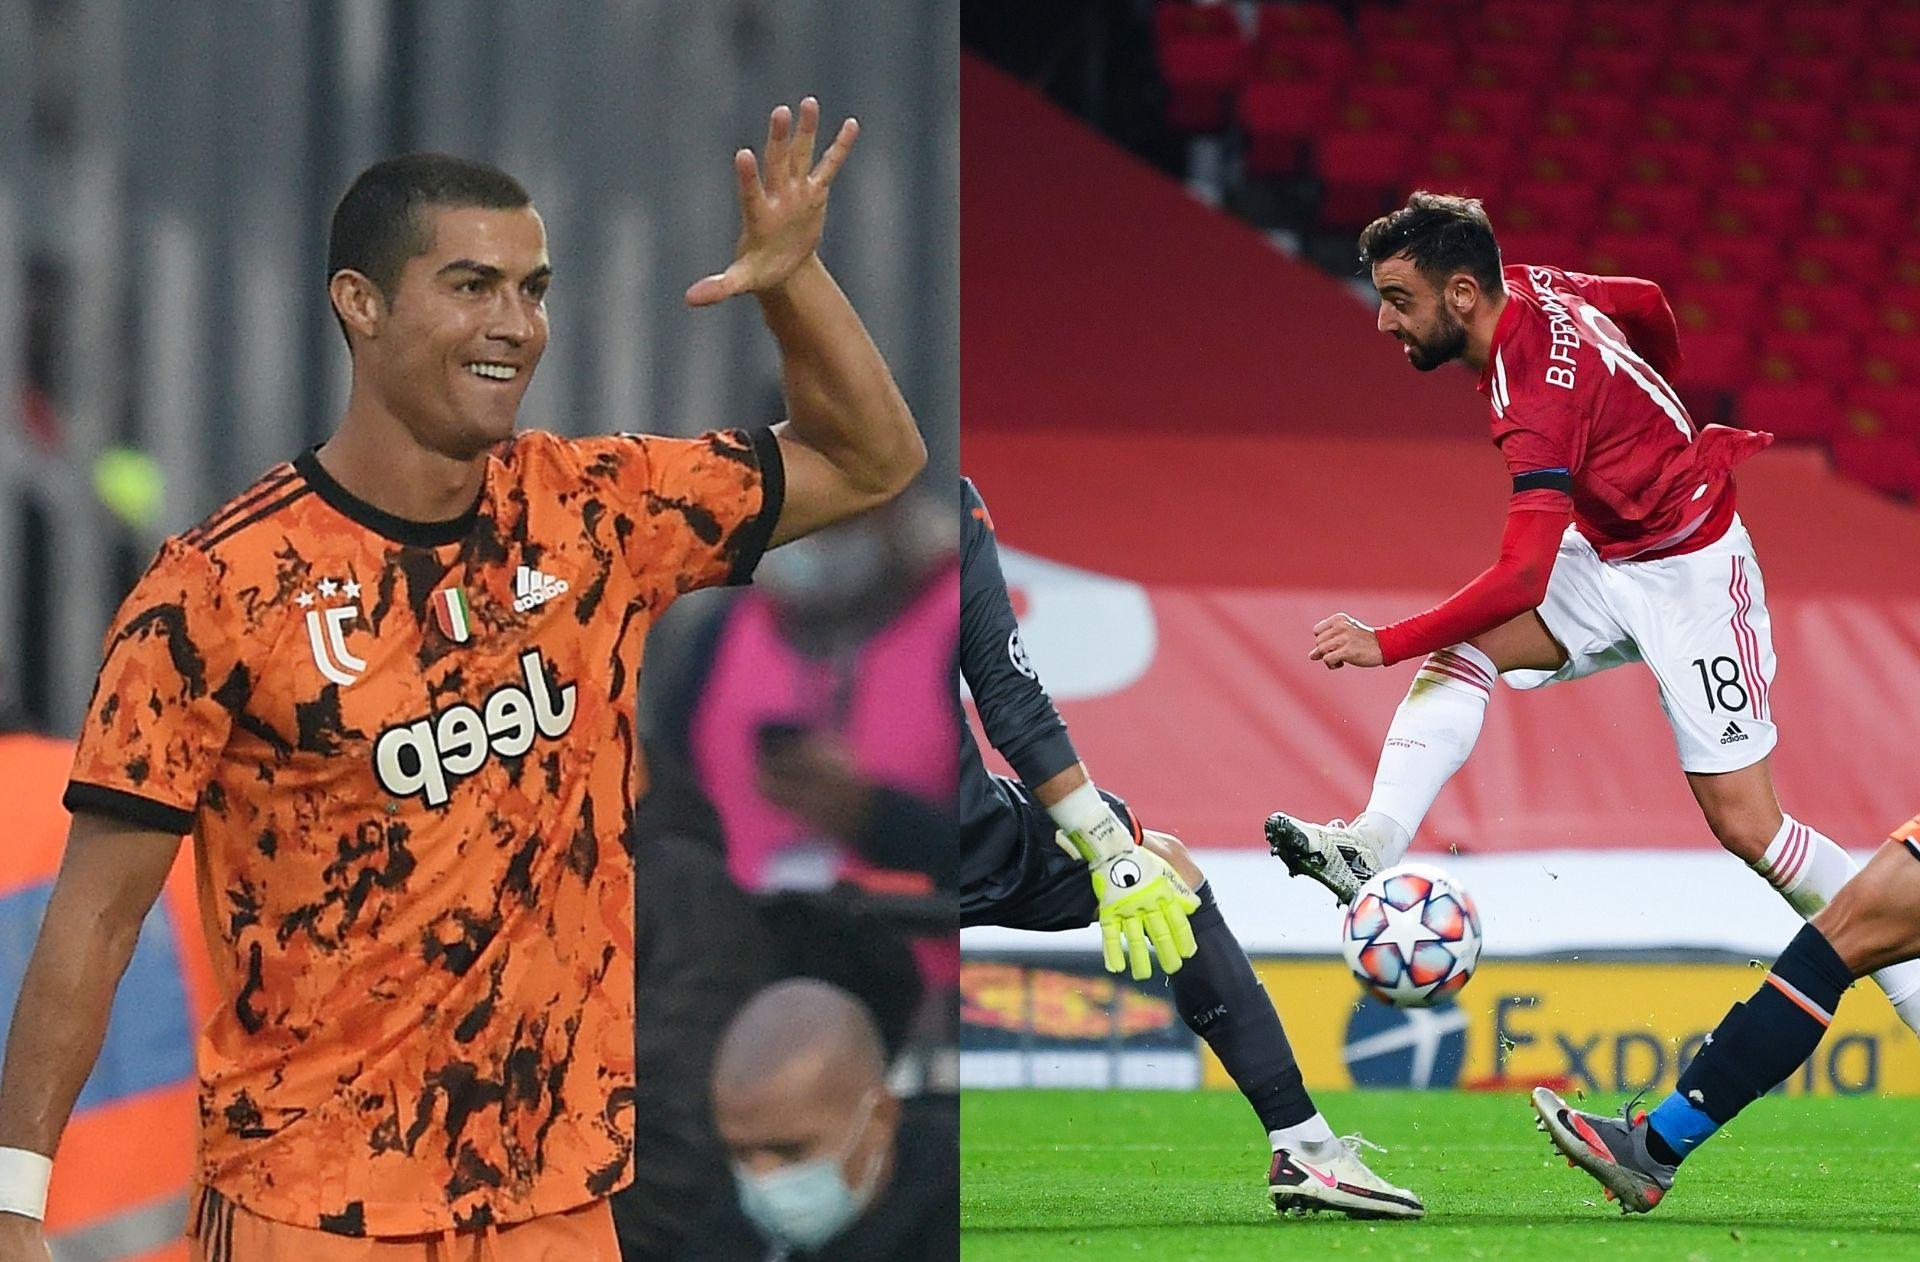 Cristiano Ronaldo of Juventus, Bruno Fernandes of Manchester United